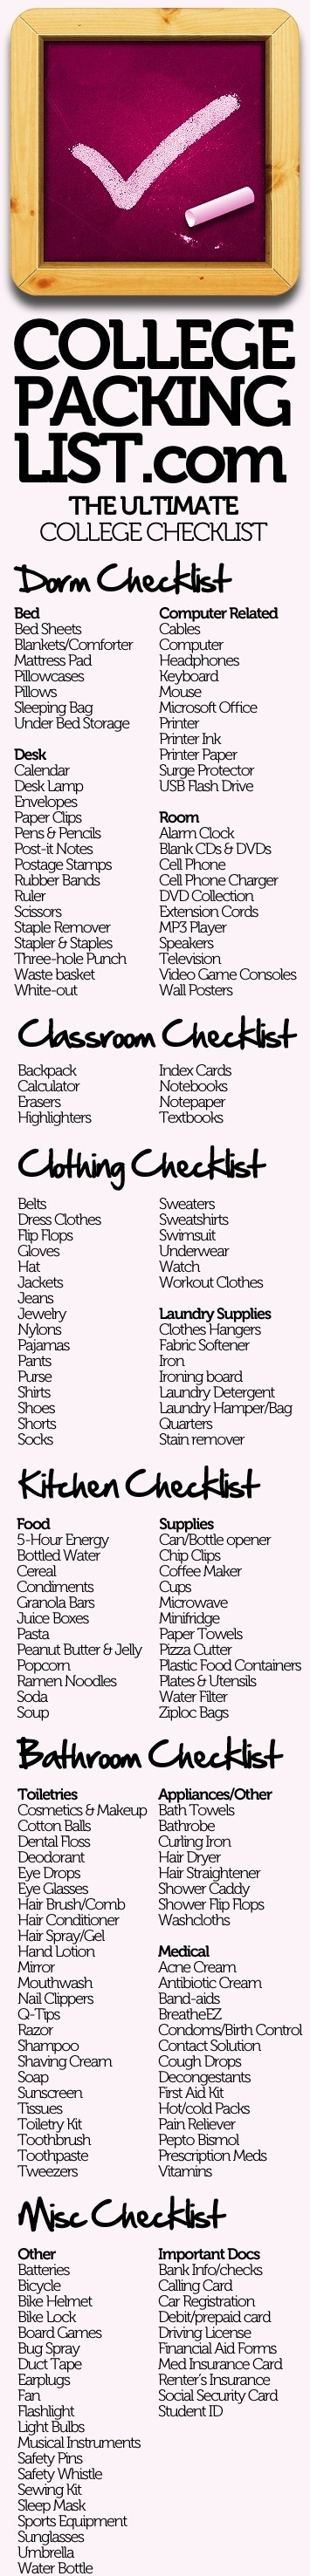 Dorm Checklist!